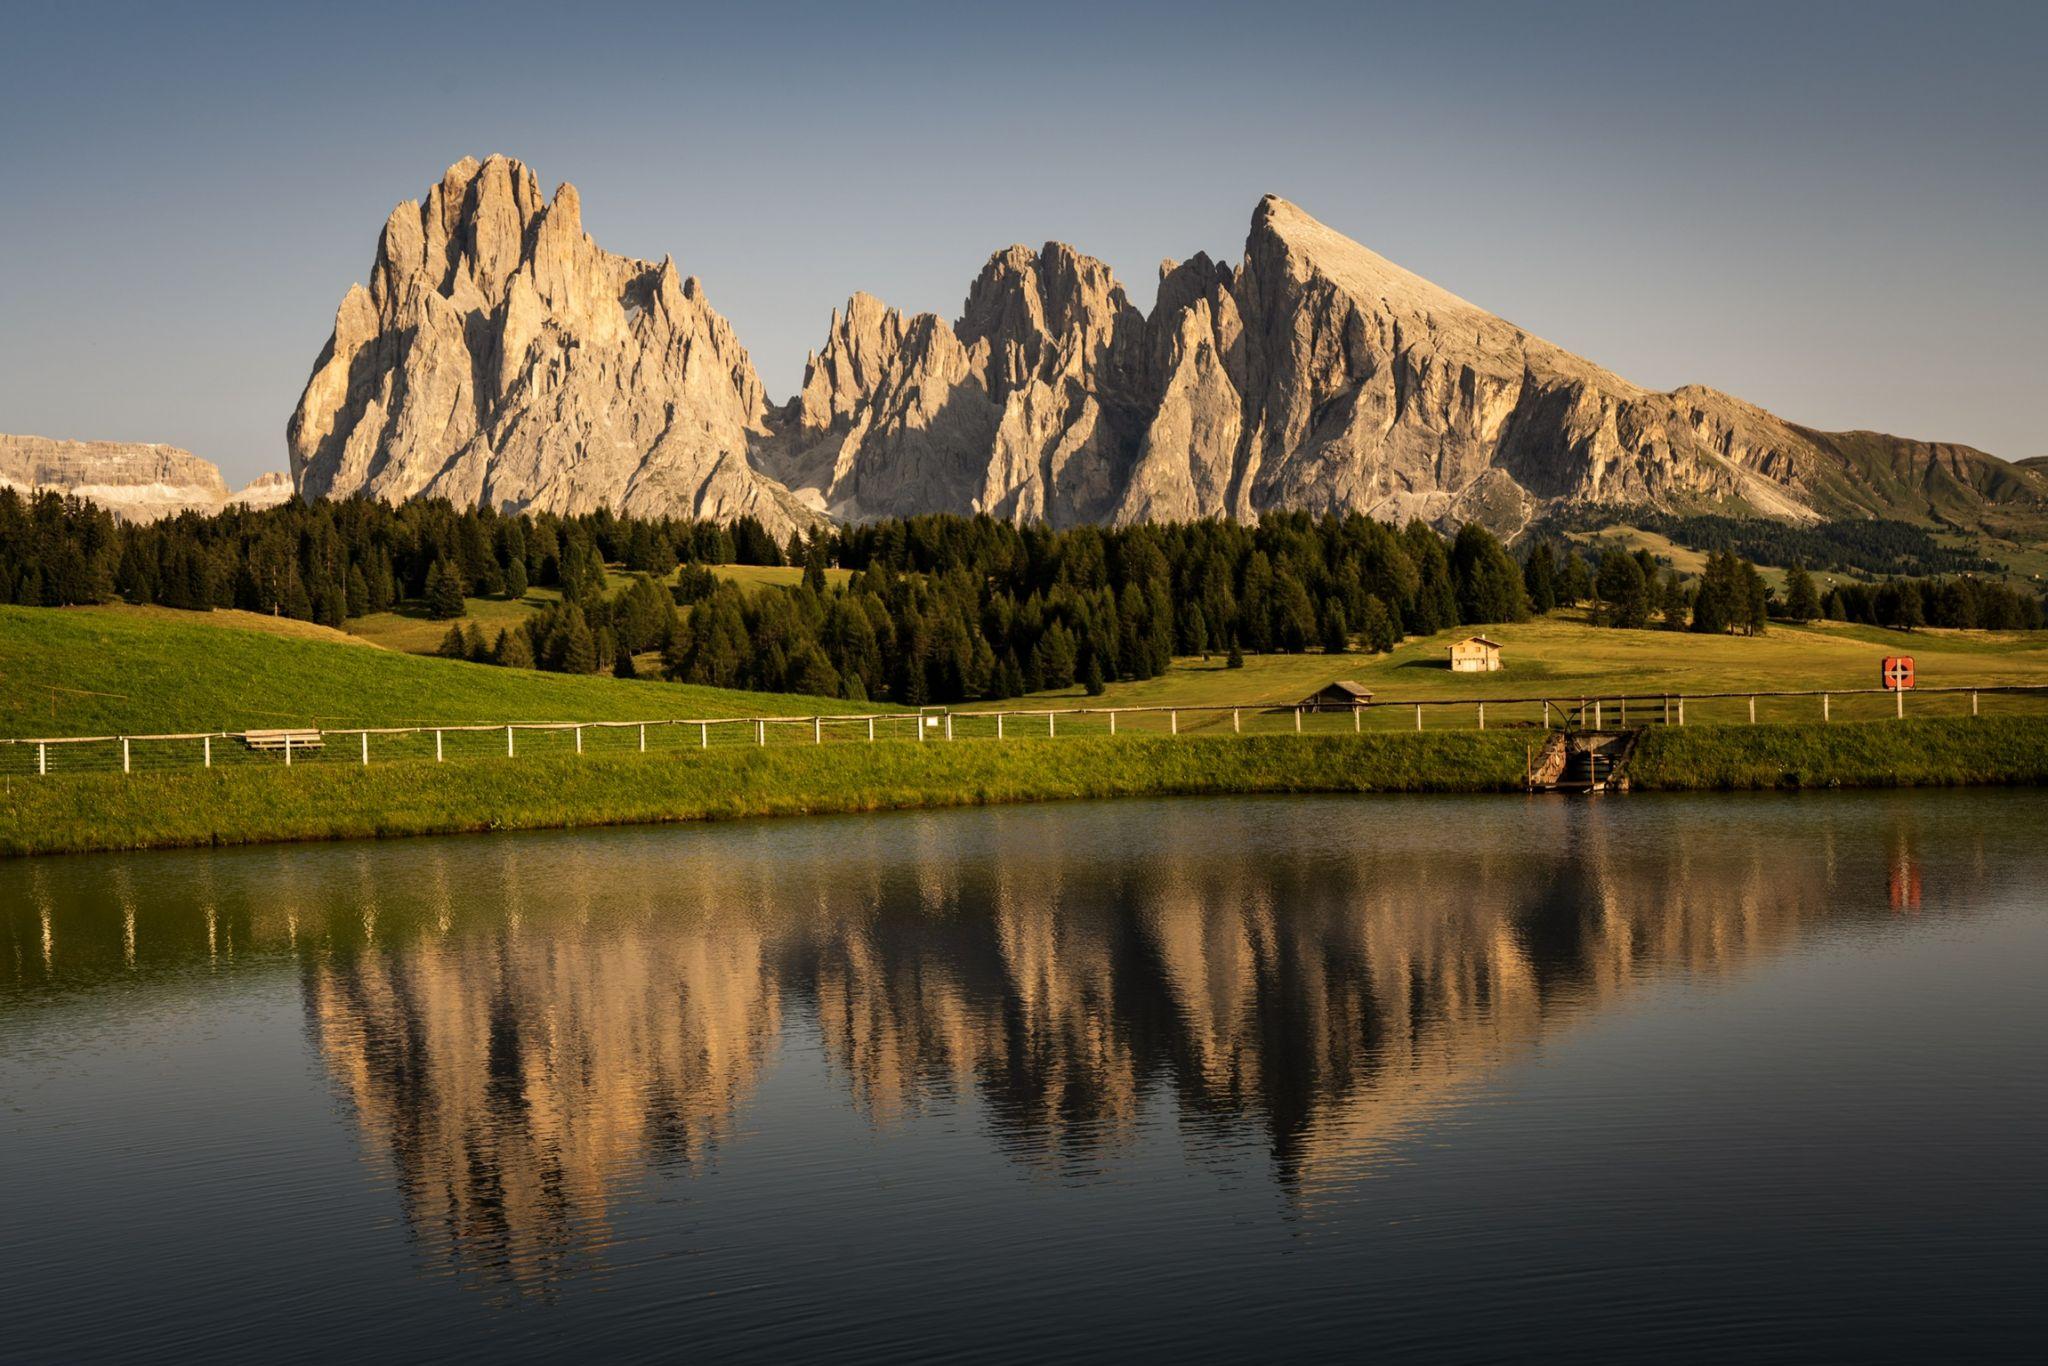 Alpe di Siusi / Seiser Alm next to Sporthotel Sonne, Italy